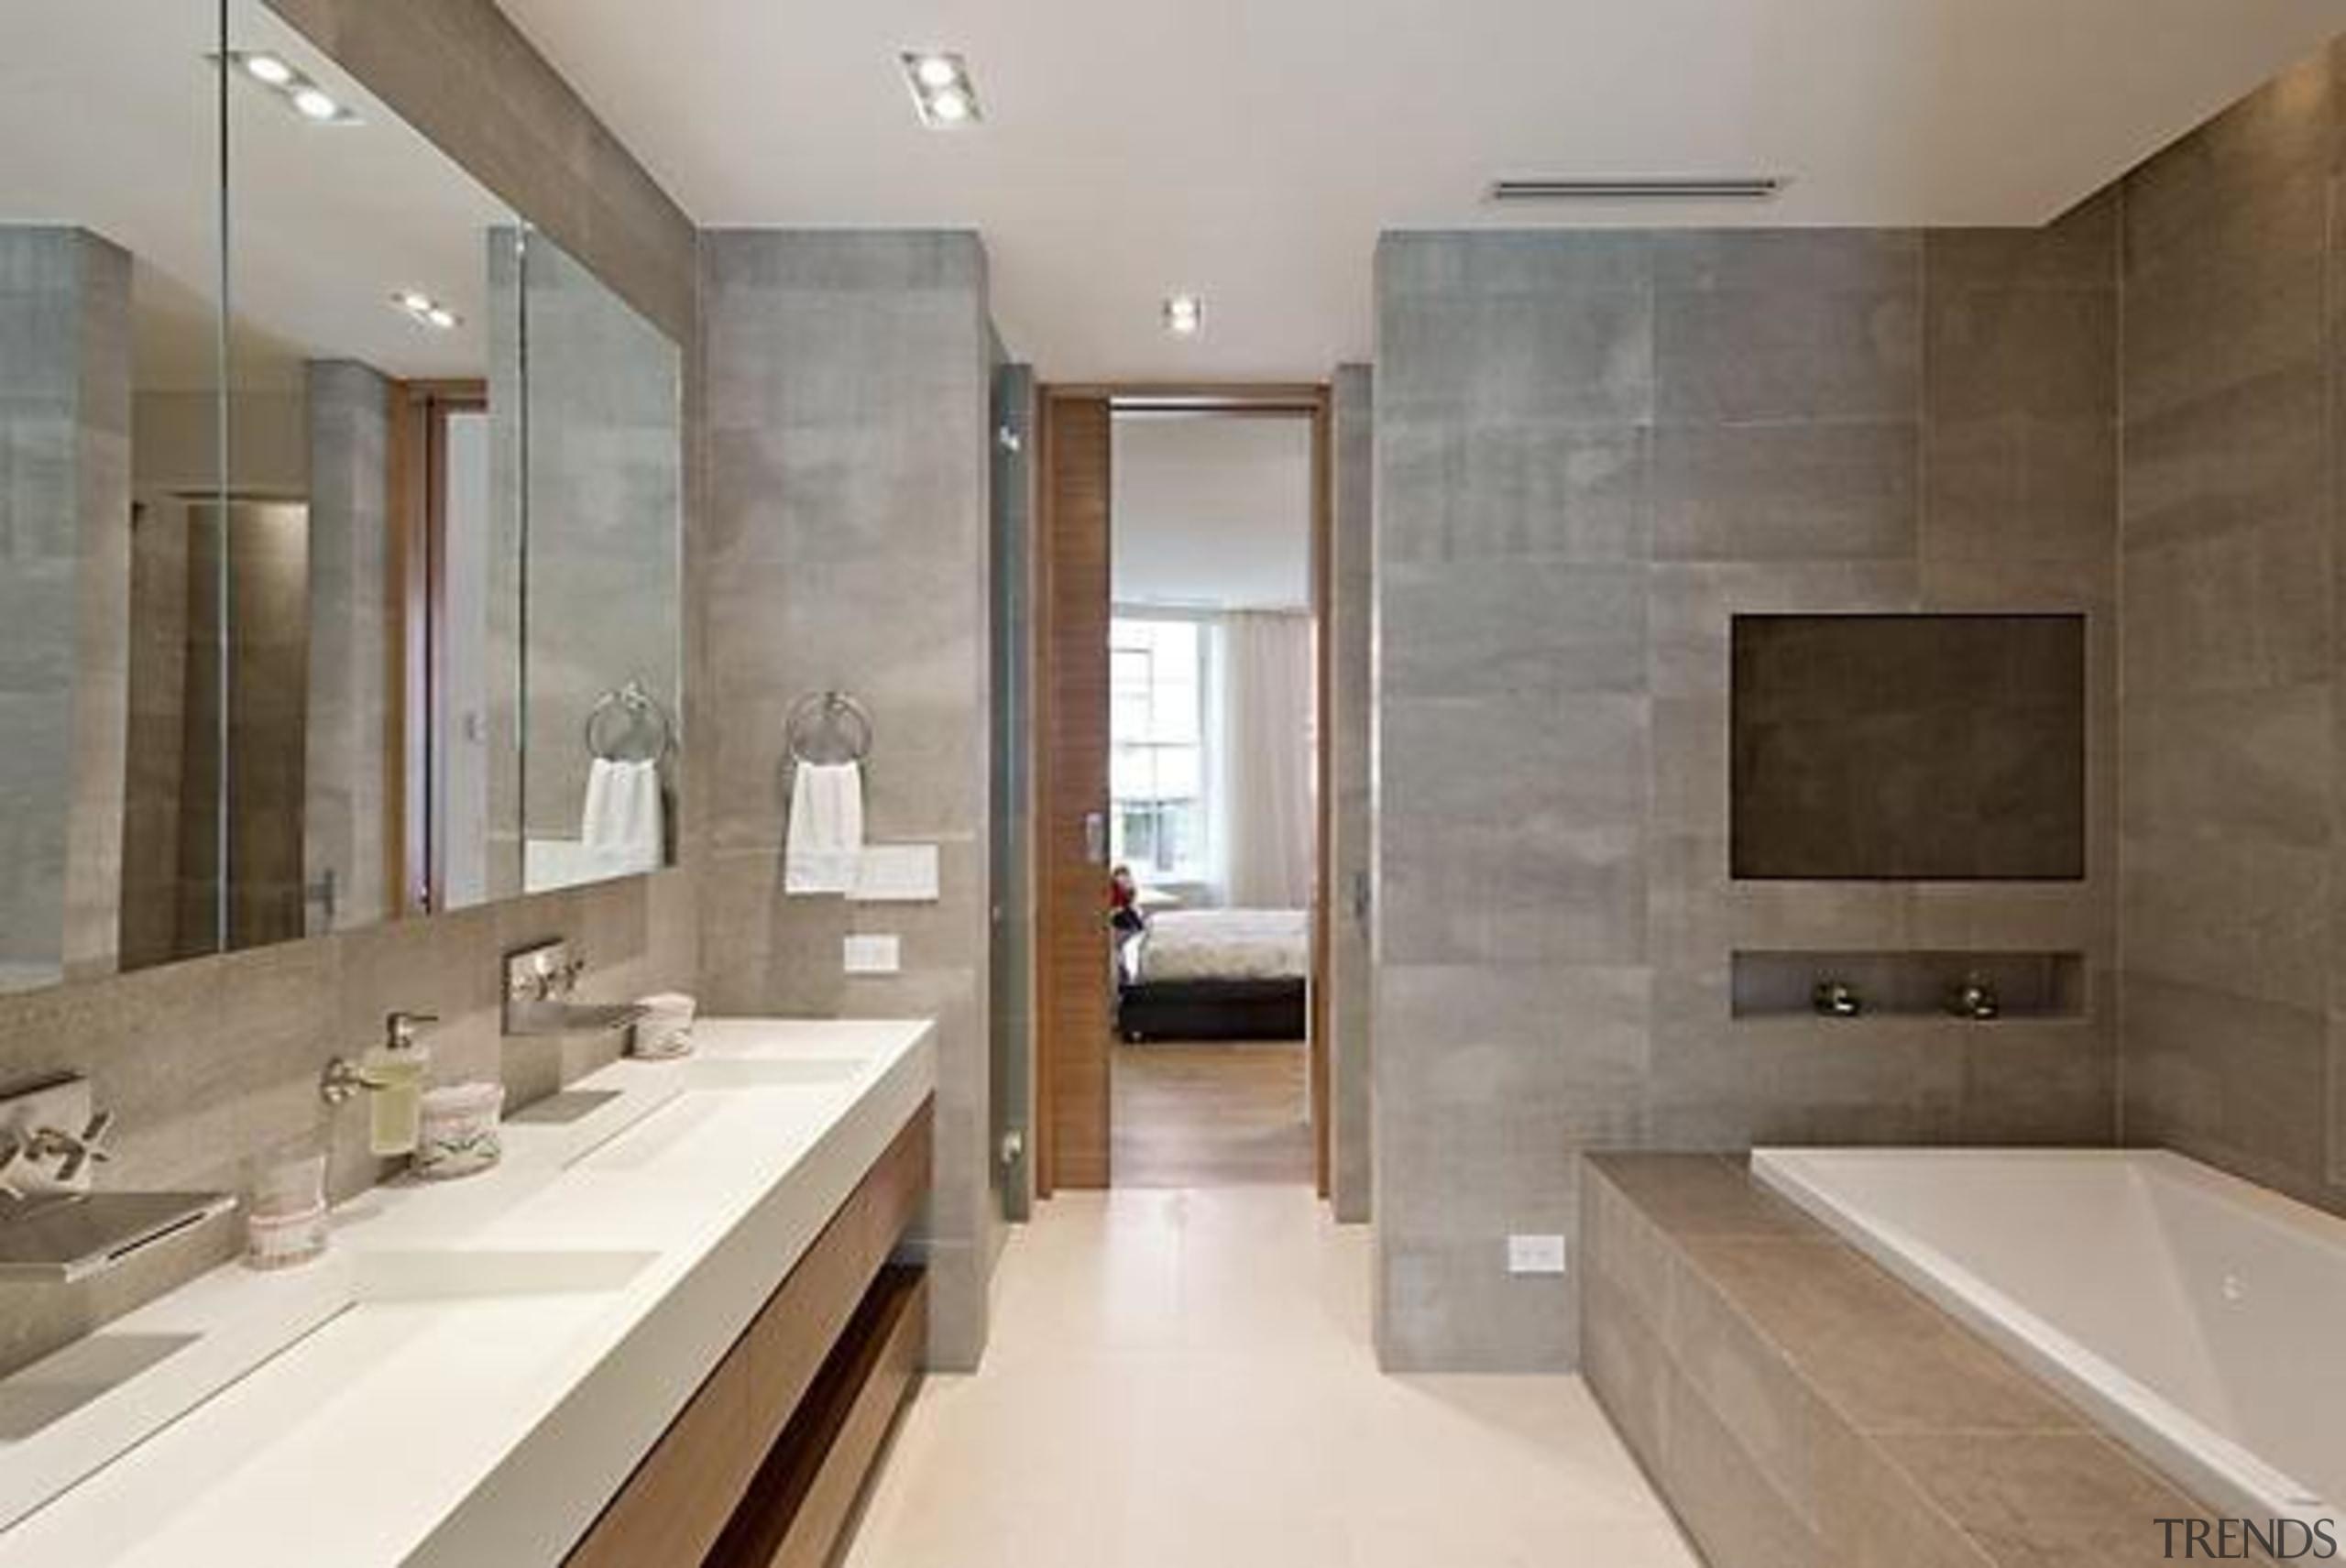 Source: Trulia architecture, bathroom, estate, floor, flooring, interior design, property, real estate, room, suite, tile, gray, brown